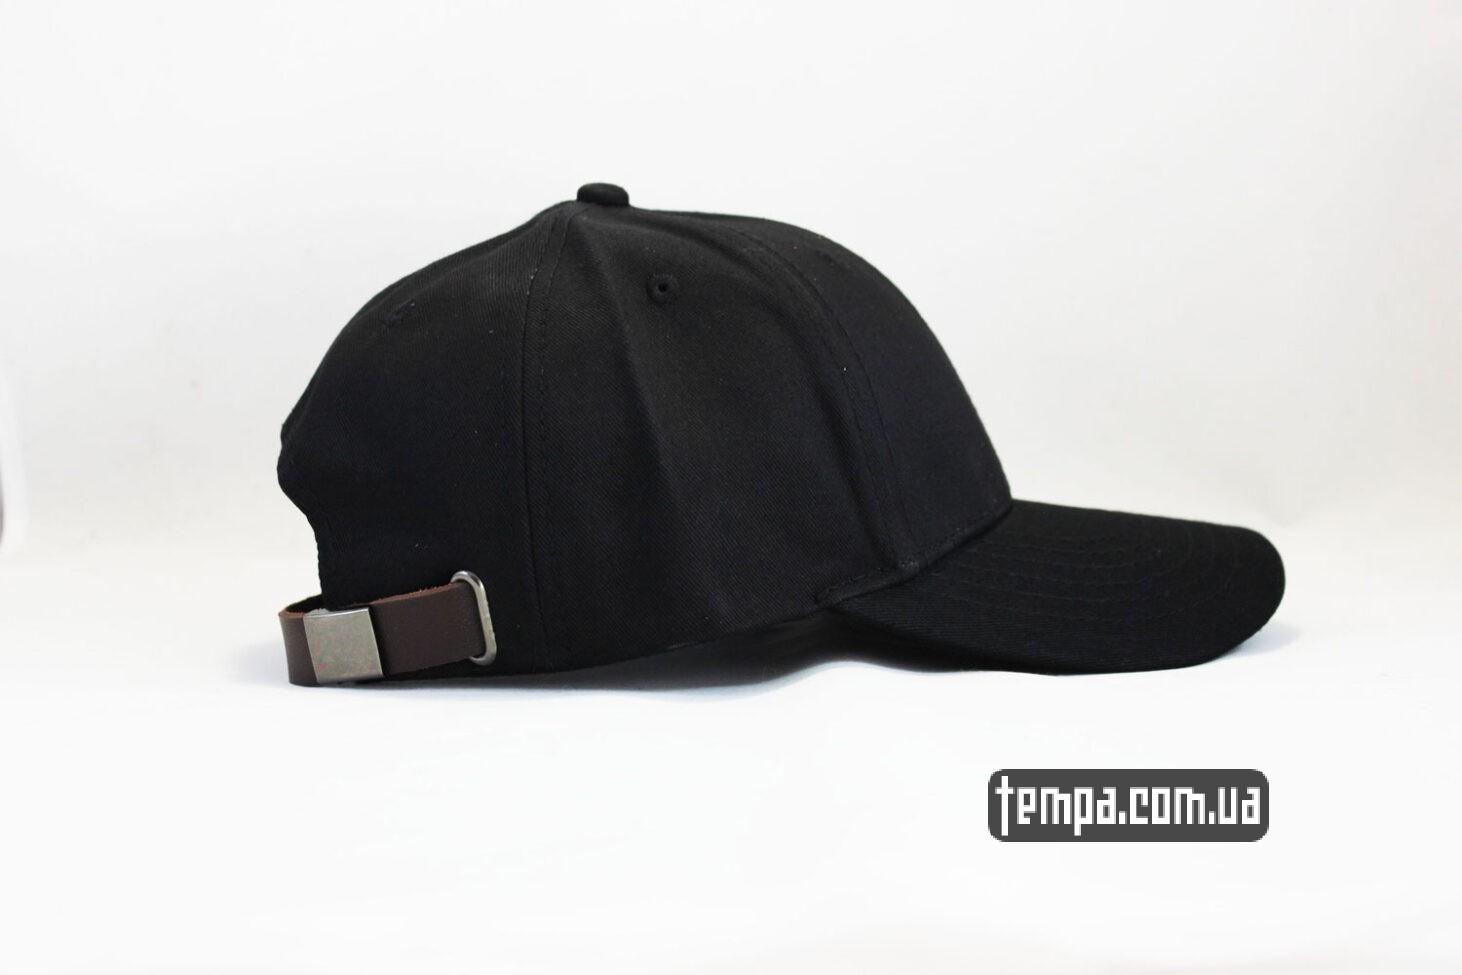 снебпки украина кепка бейсболка Champion черная логотип сбоку-2